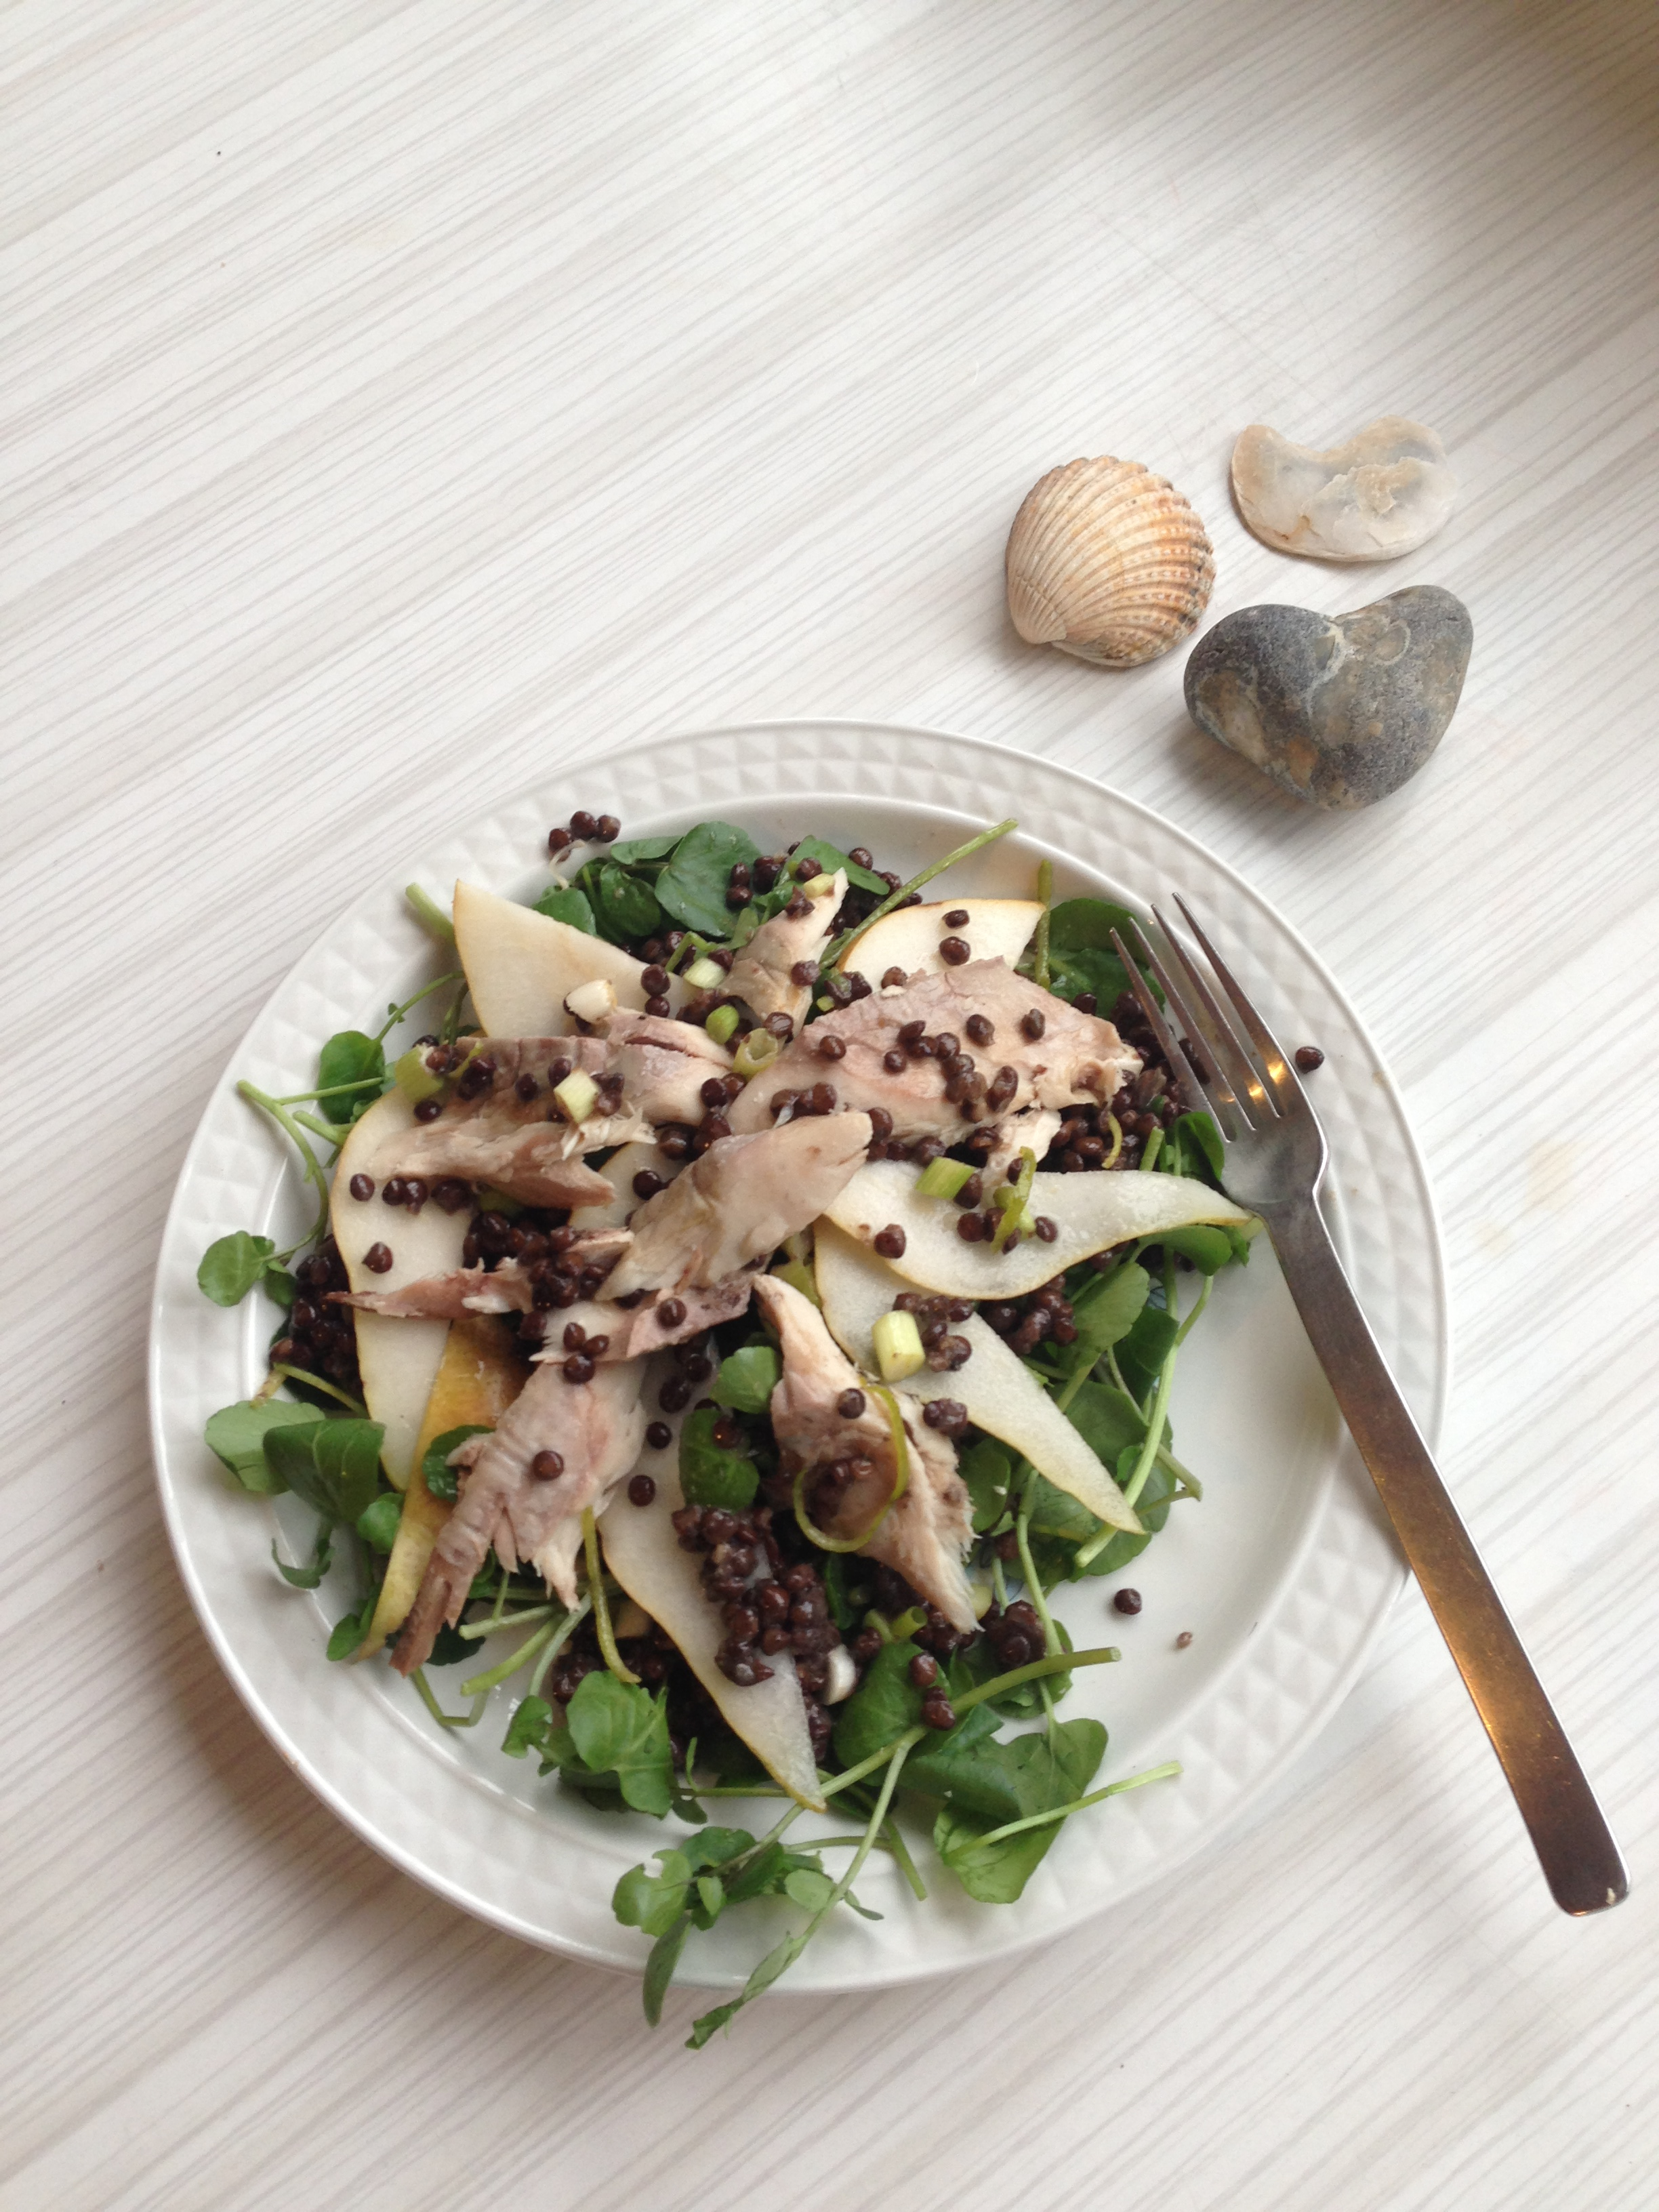 Autumn Salad - Zingy Lime, Mackerel, Pear and Lentil